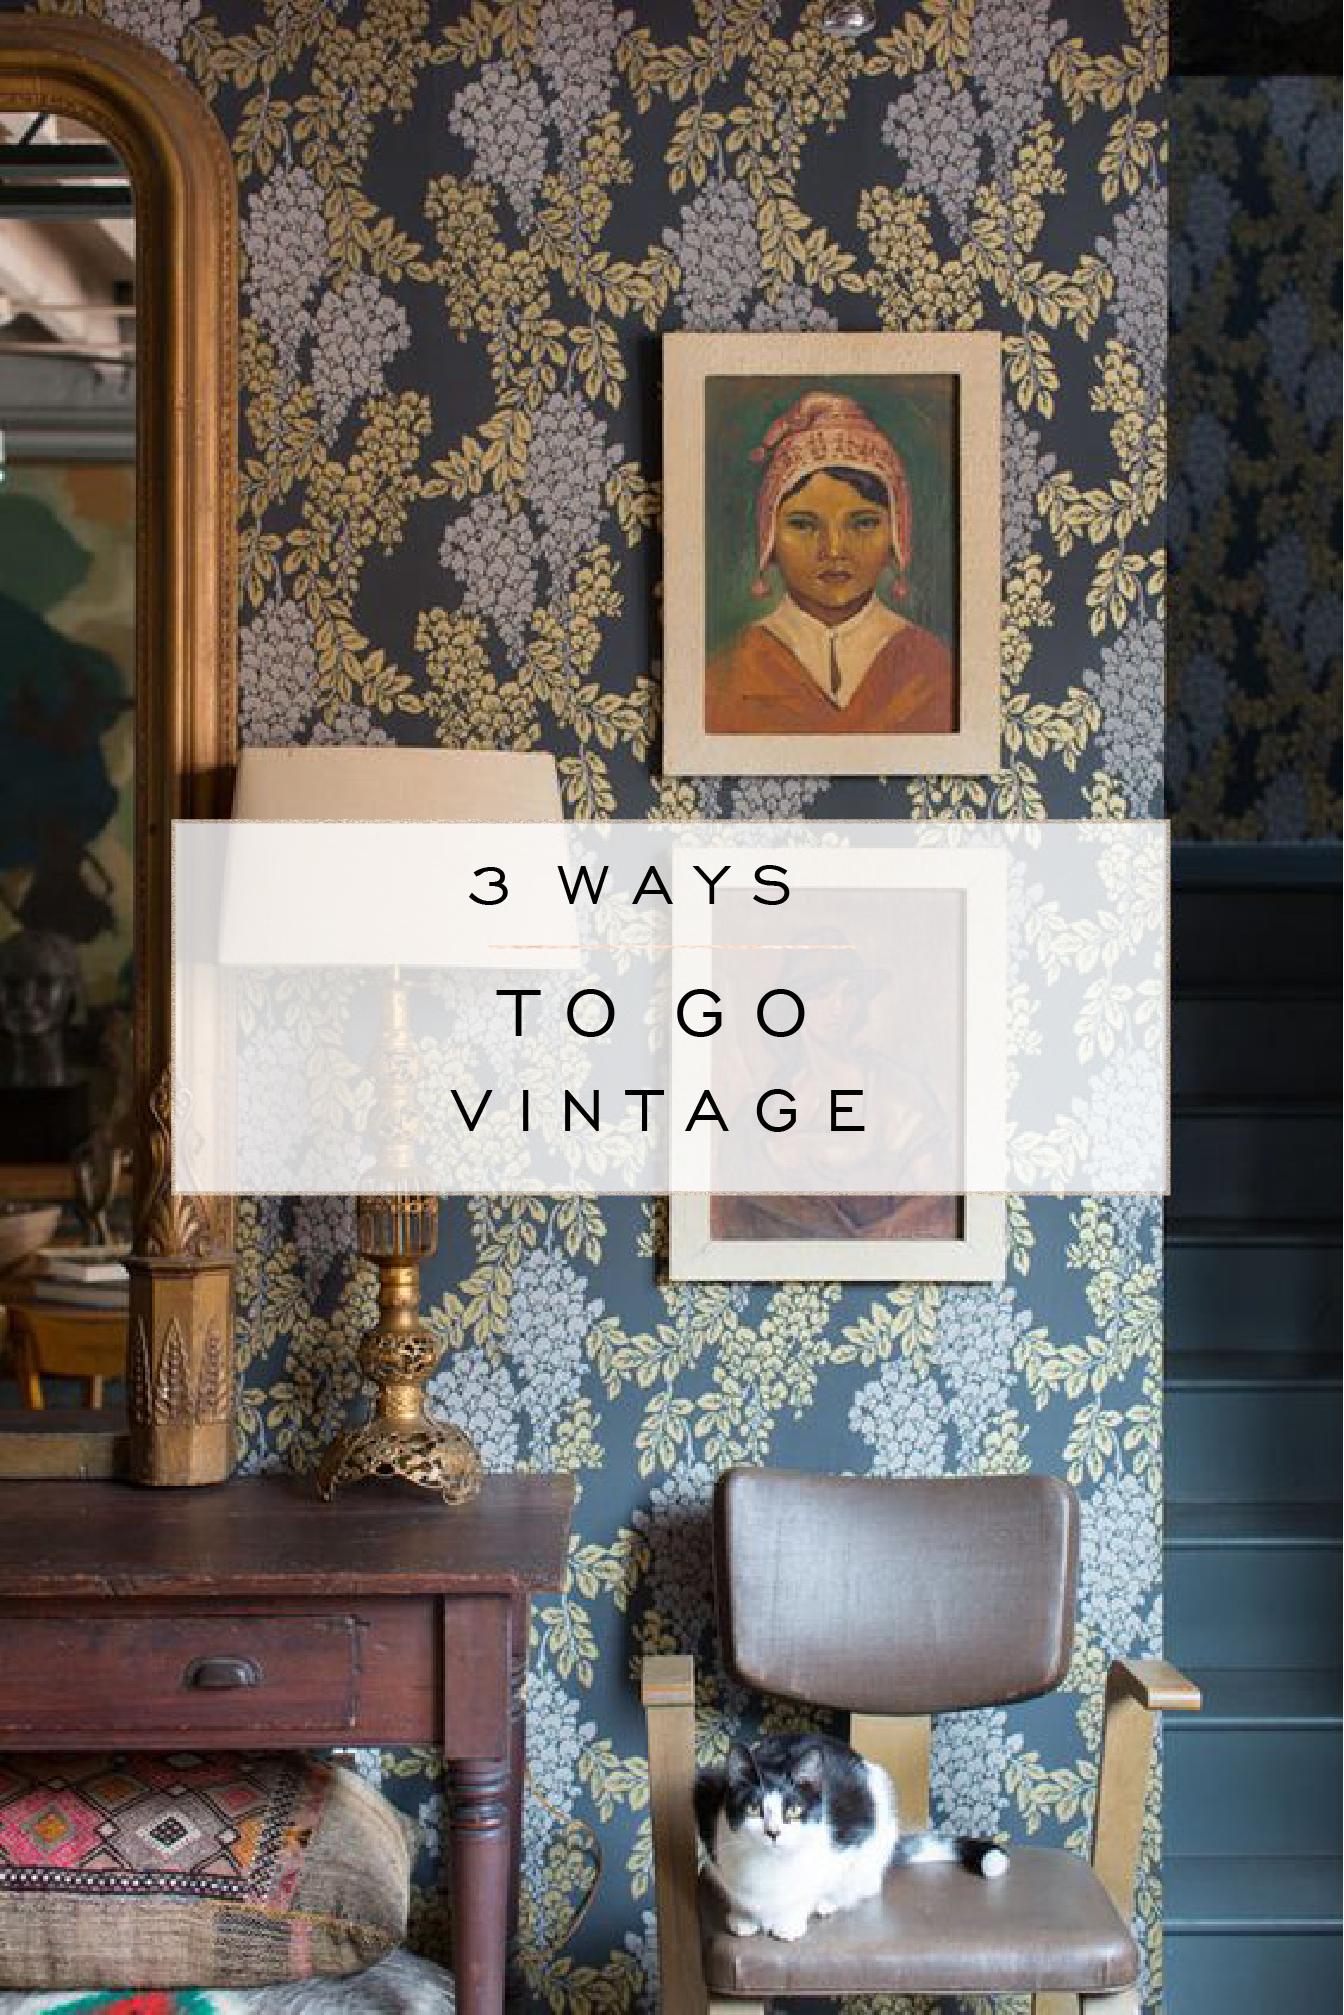 3 ways to go vintage